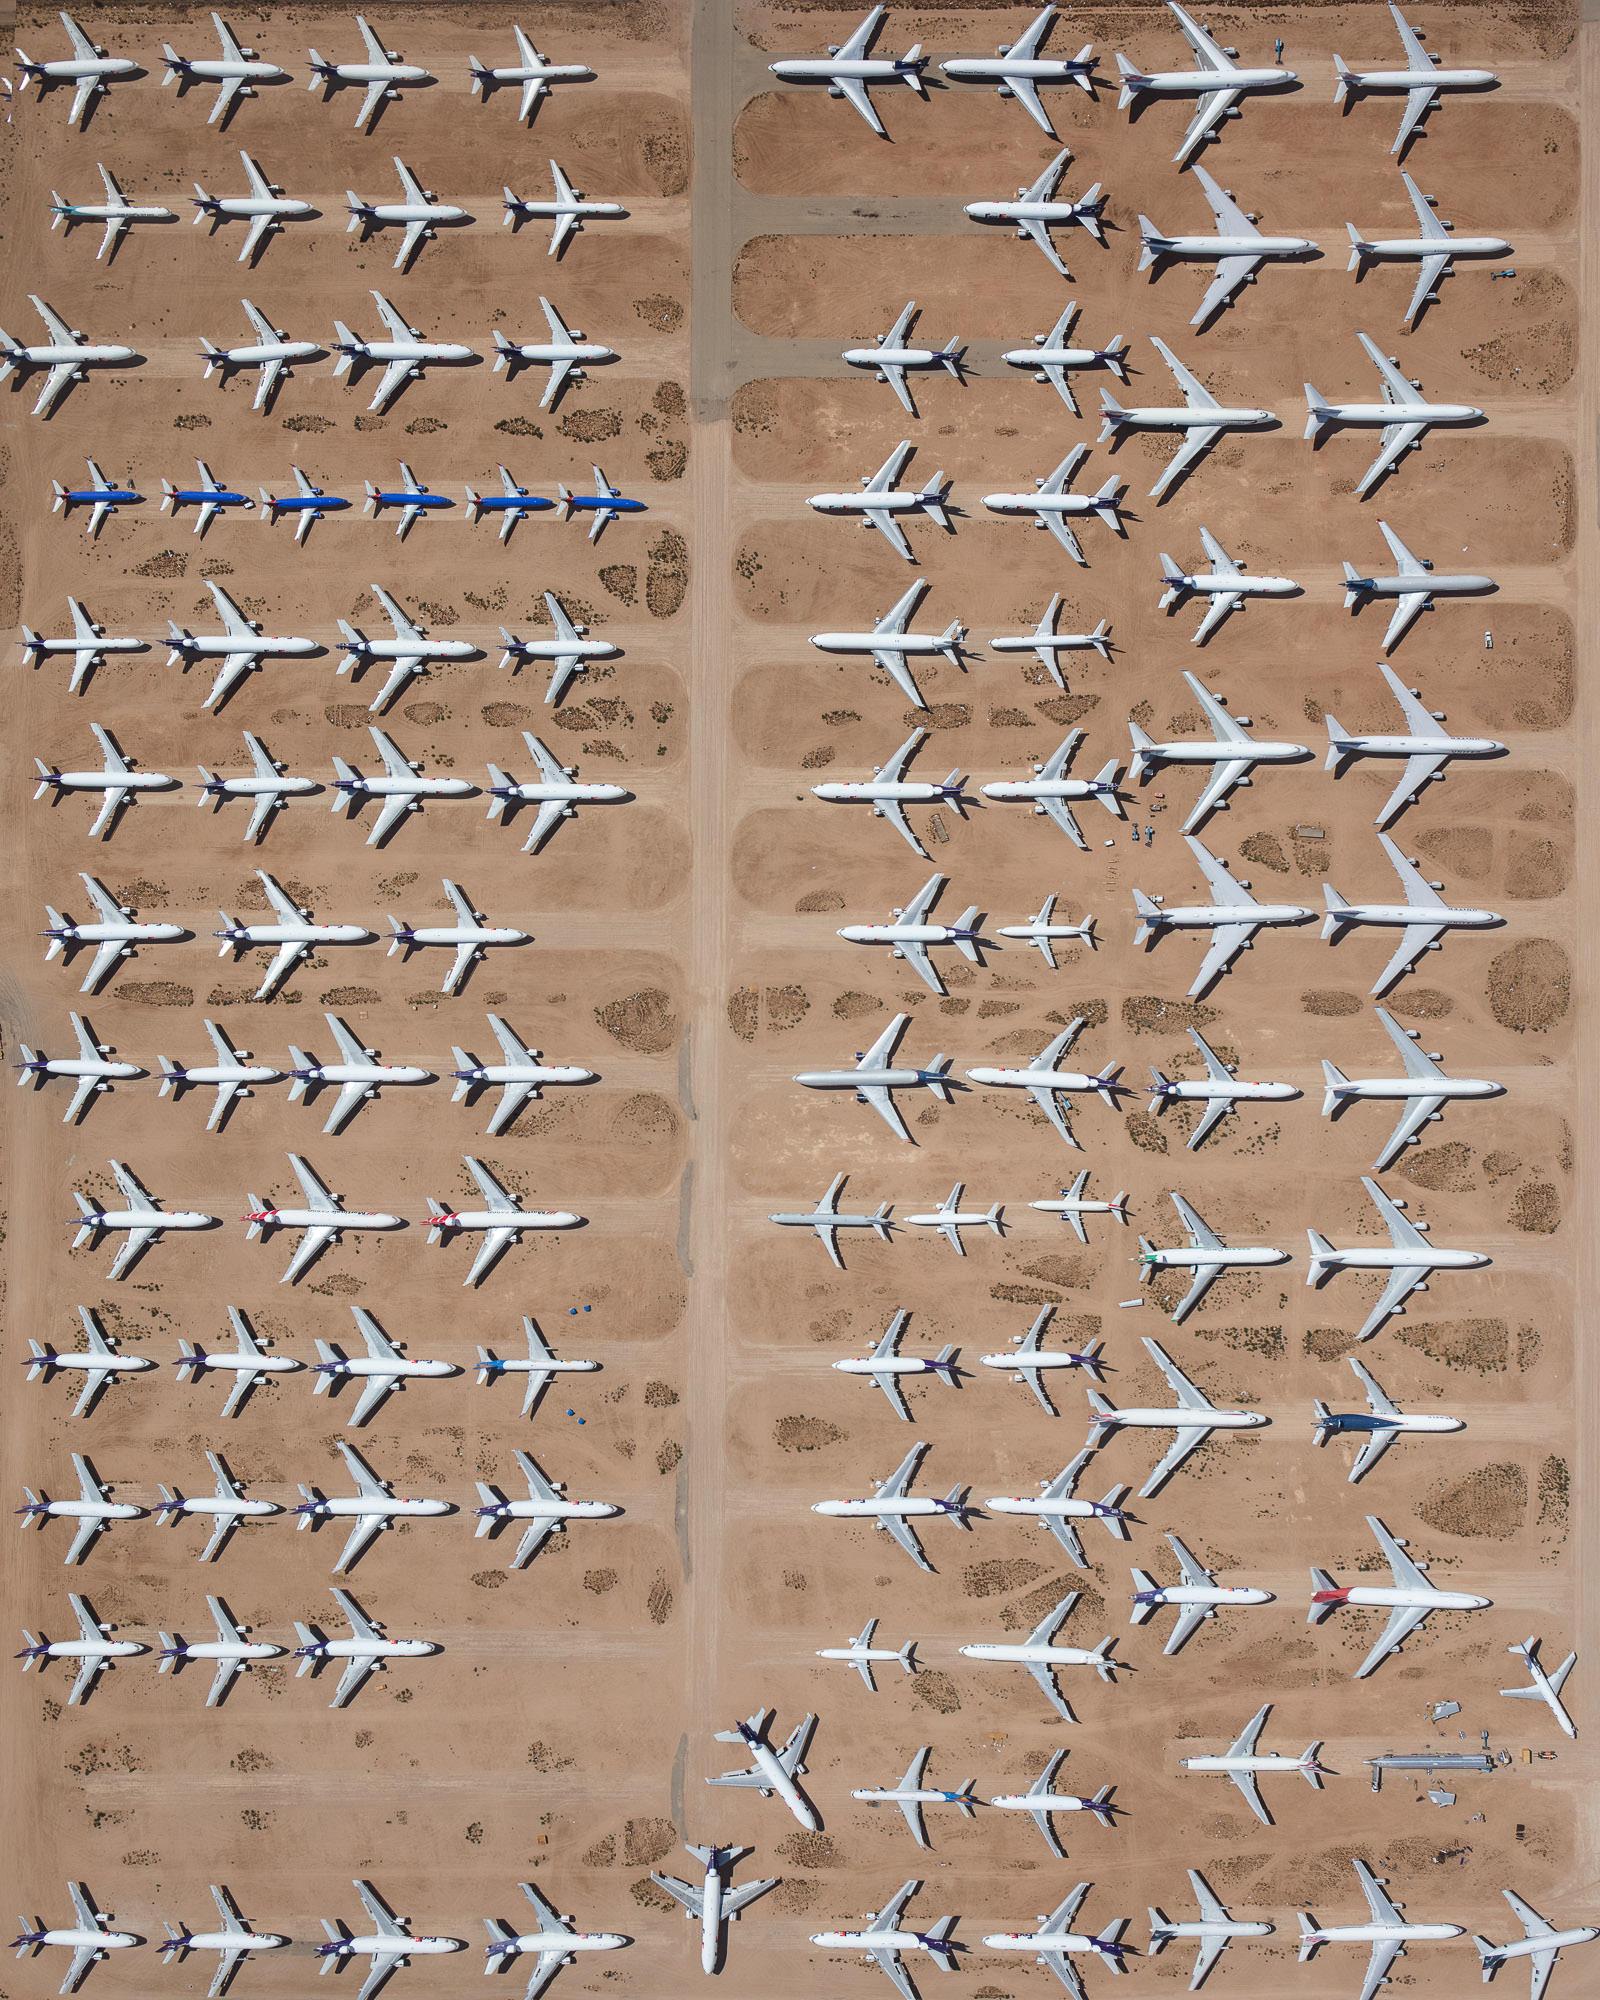 mike-kelley-life-cycles-aviation-14.jpg